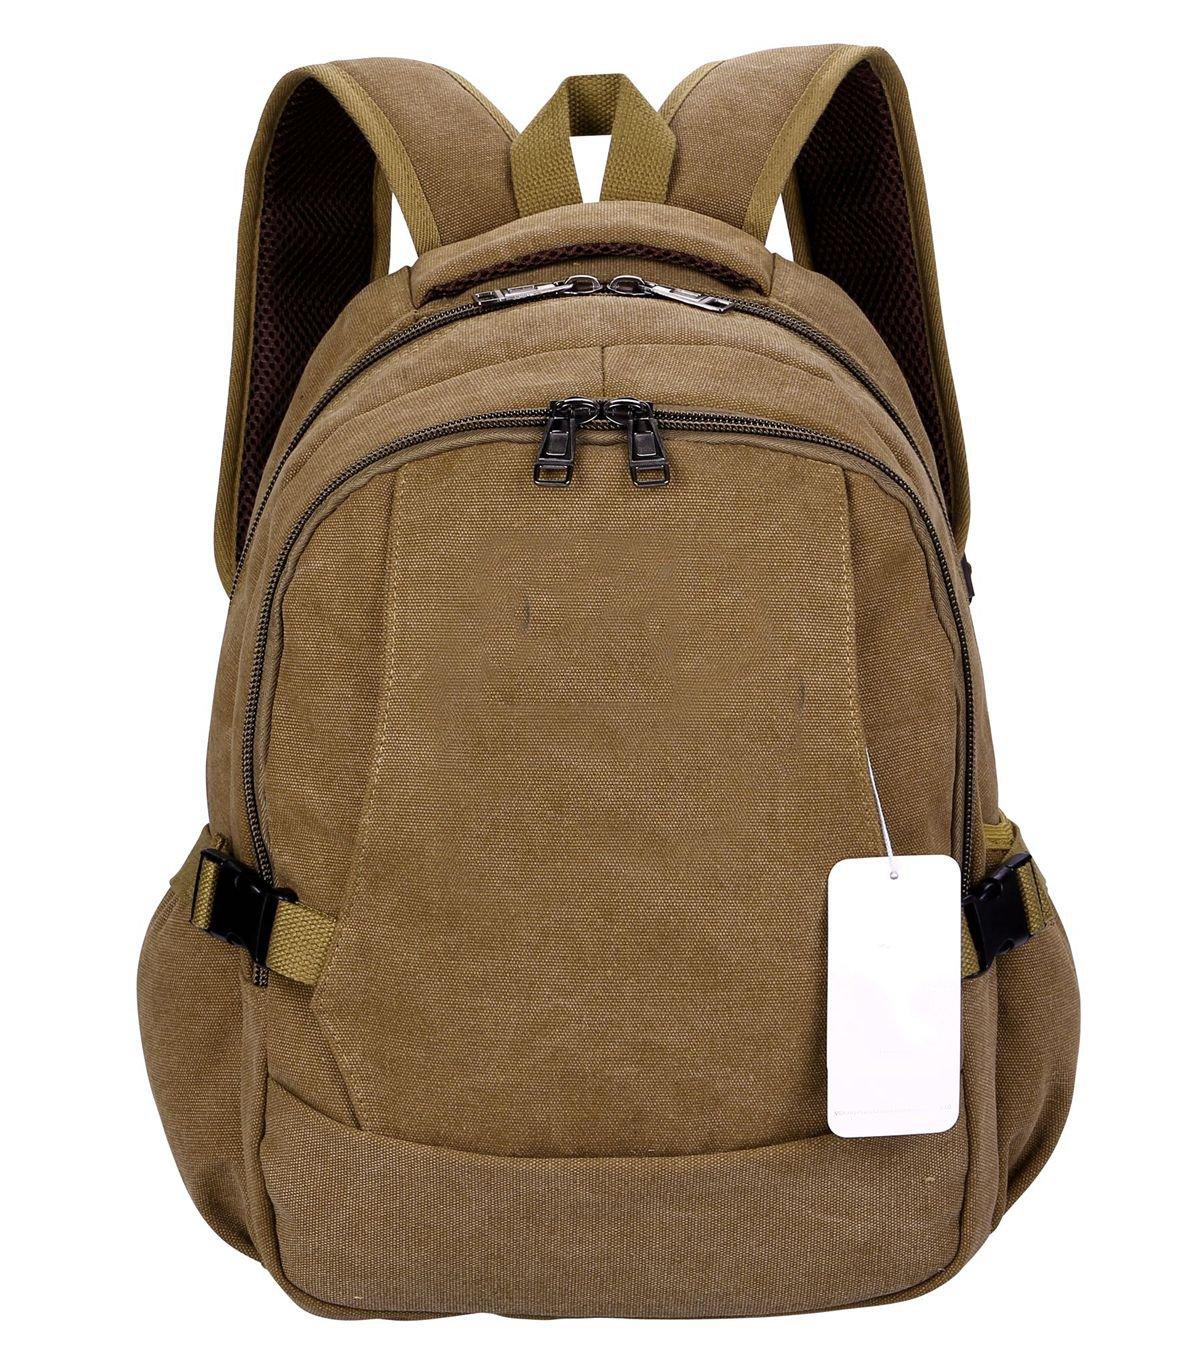 Laptop Backpack,VIDENG Business Canvas Handbags Bookbag for College Travel Backpack for Under 15 17 Inch Laptop (BCS-Brown) by VIDENG (Image #1)